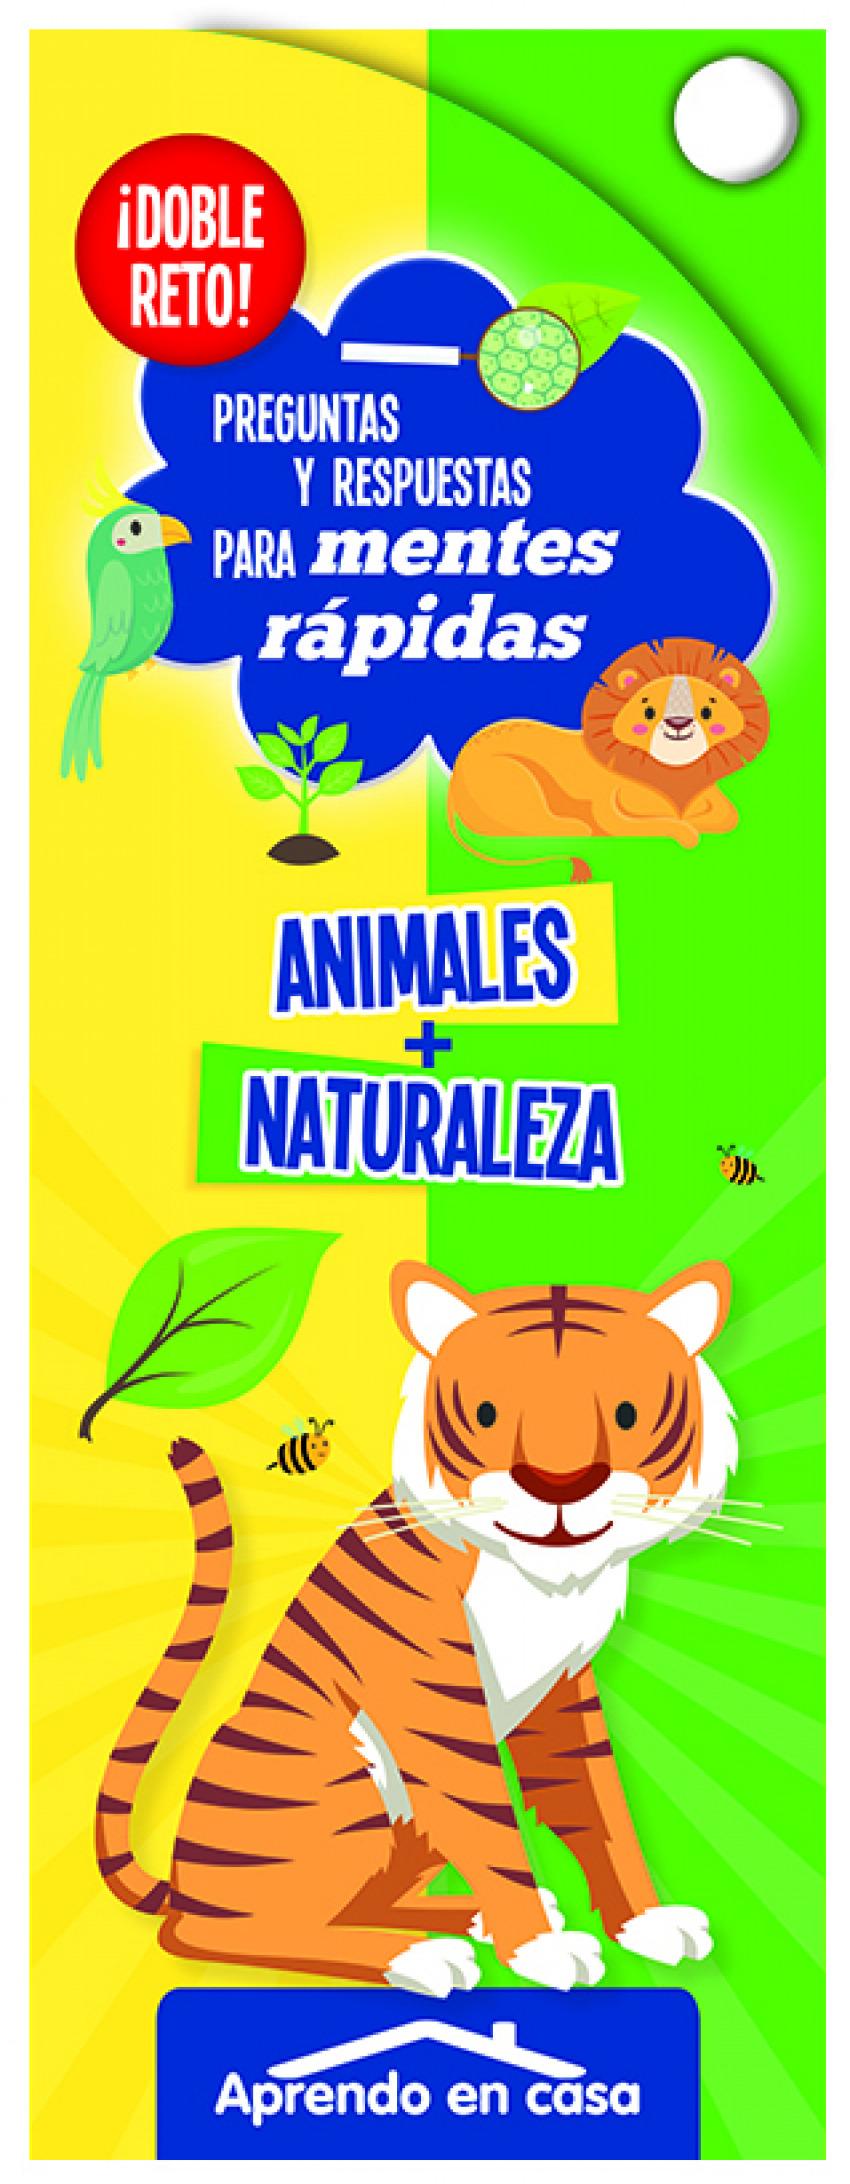 APRENDO EN CASA DOBLE RETO - ANIMALES NATURALEZA